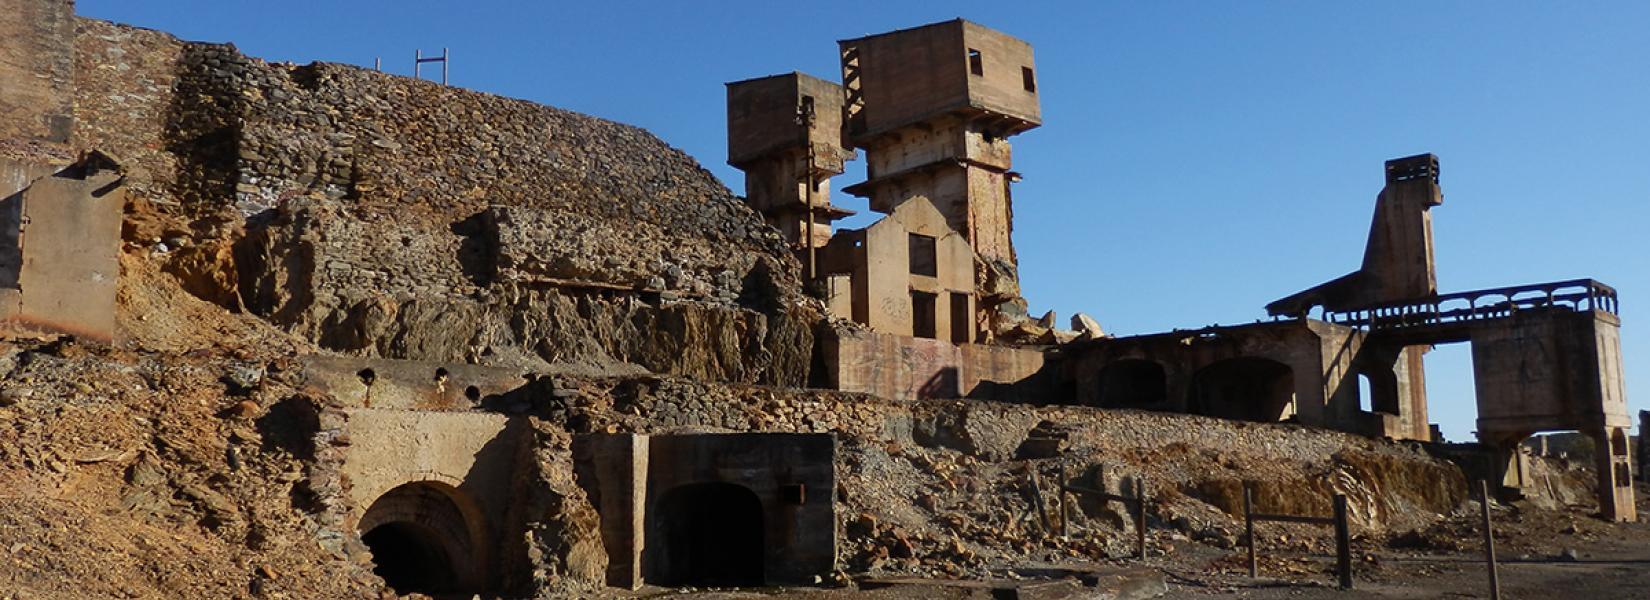 The abandoned mine of Achada do Gamo